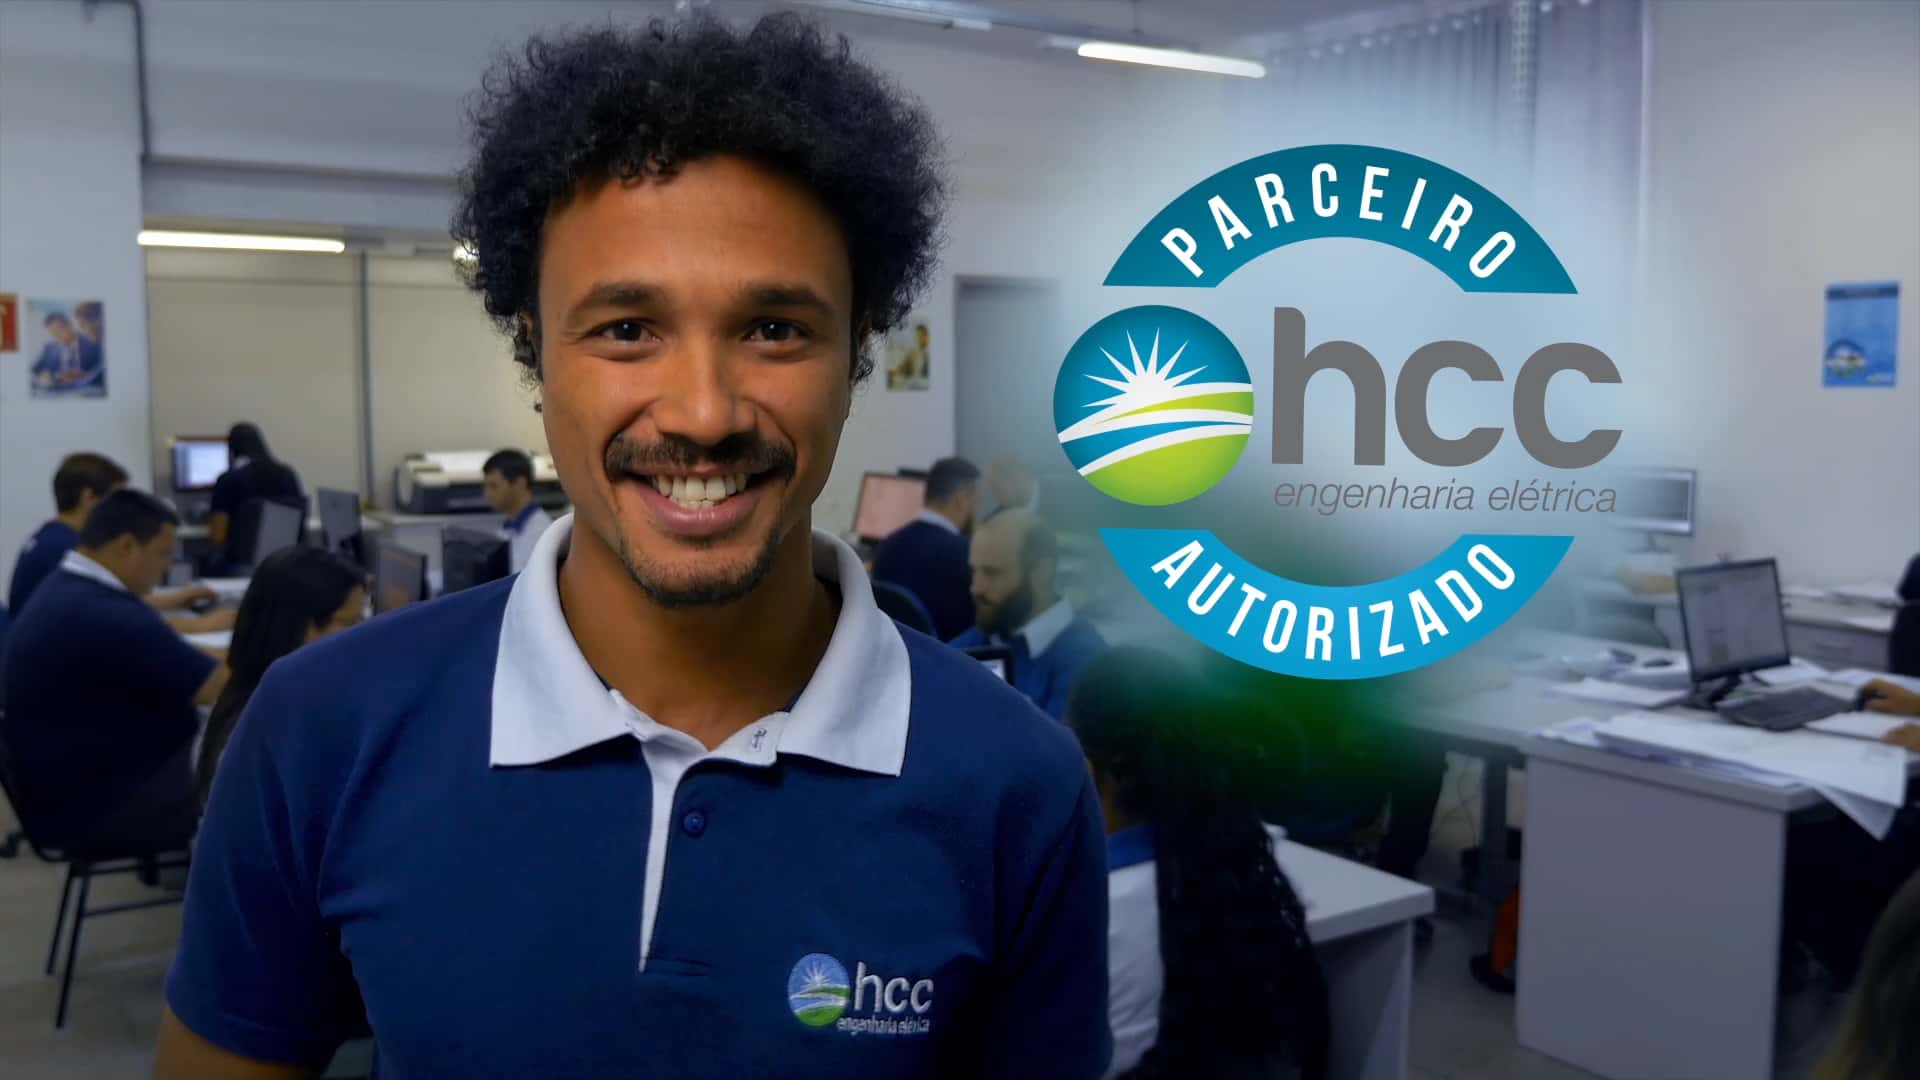 HCC Engenharia